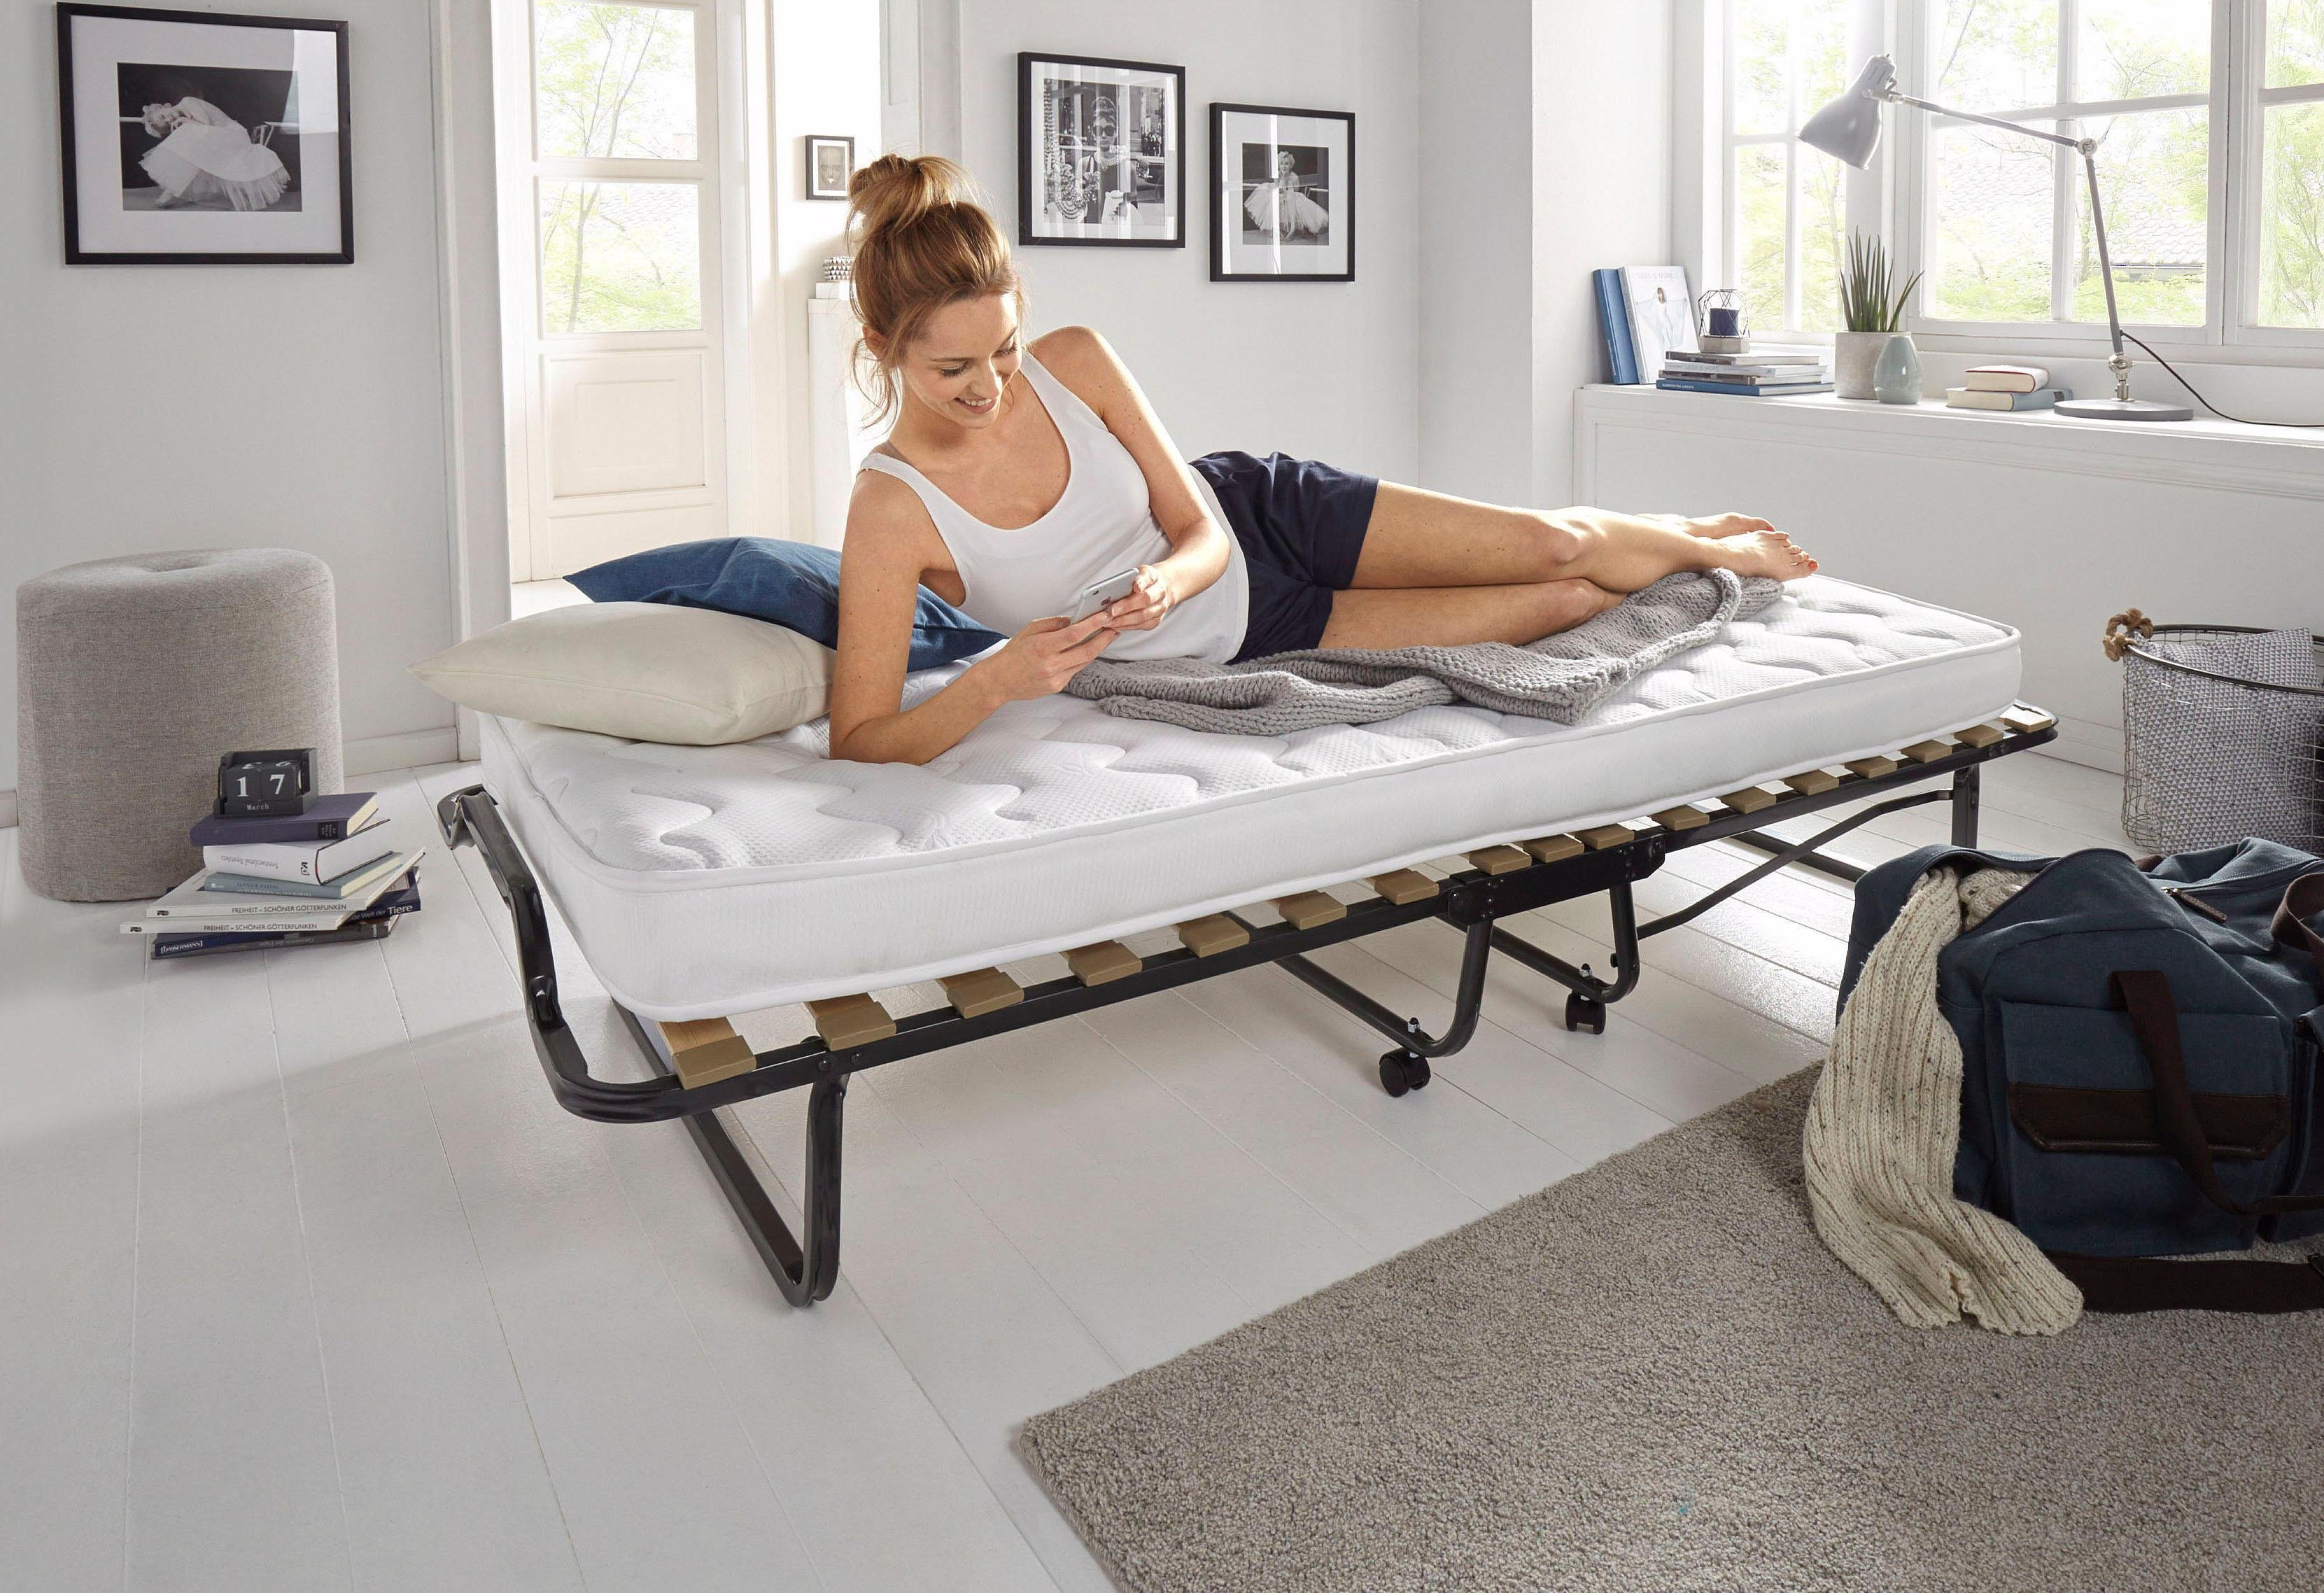 Gästebett inkl. Staubschutzhülle | Schlafzimmer > Betten > Gästebetten